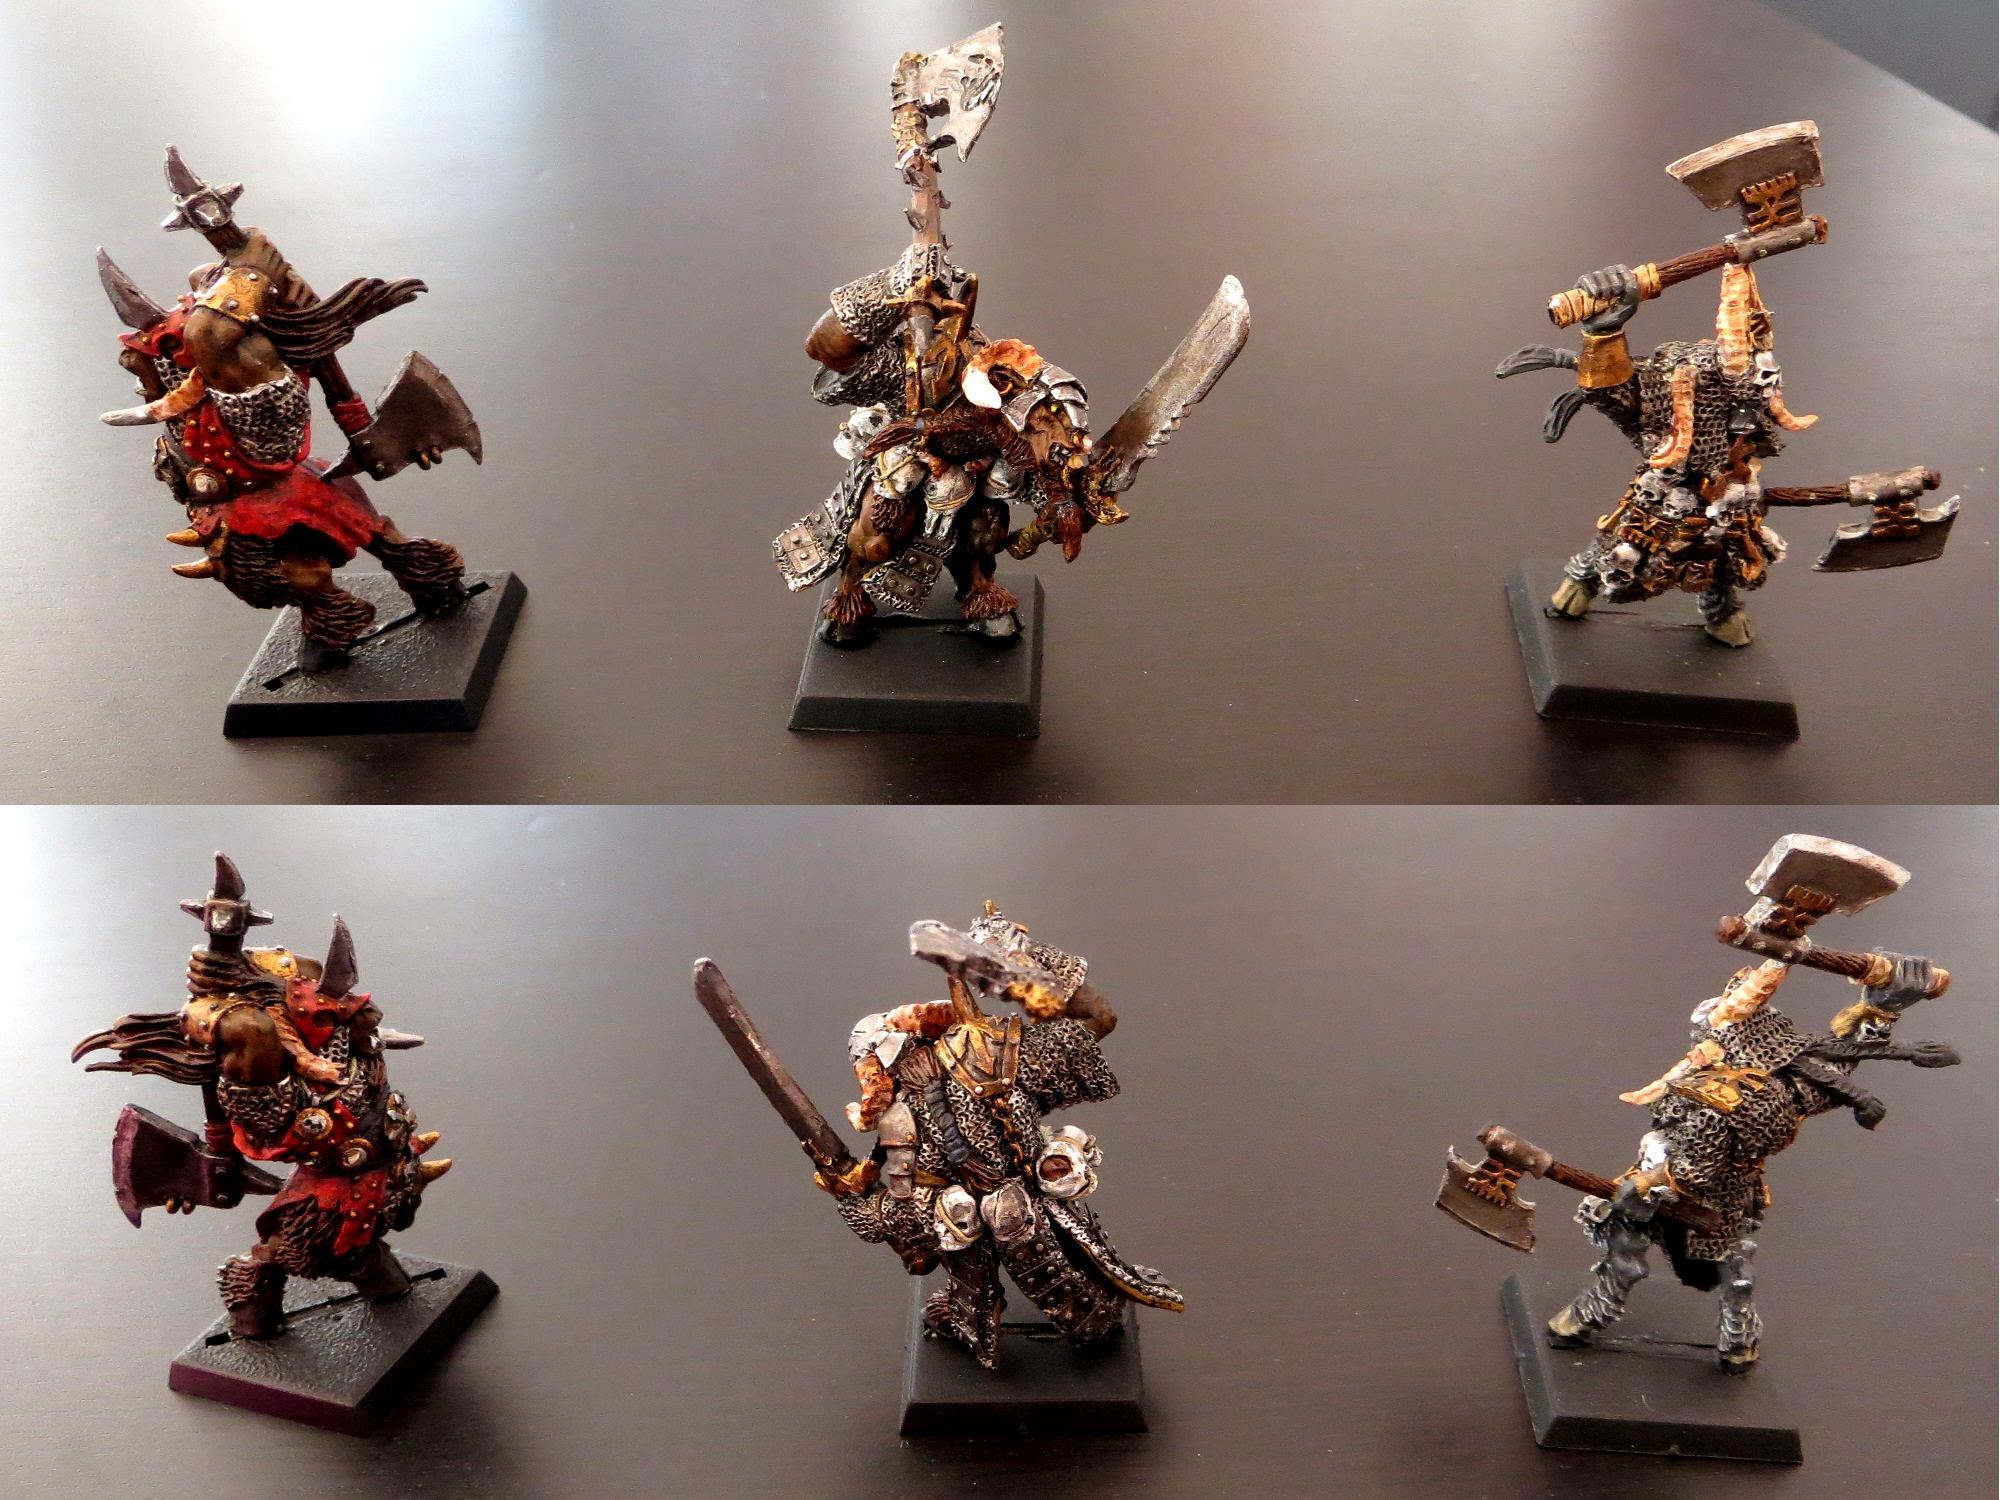 Beastmen, Bestigor, Chaos, Hero, Korngor, Mordheim, Warband